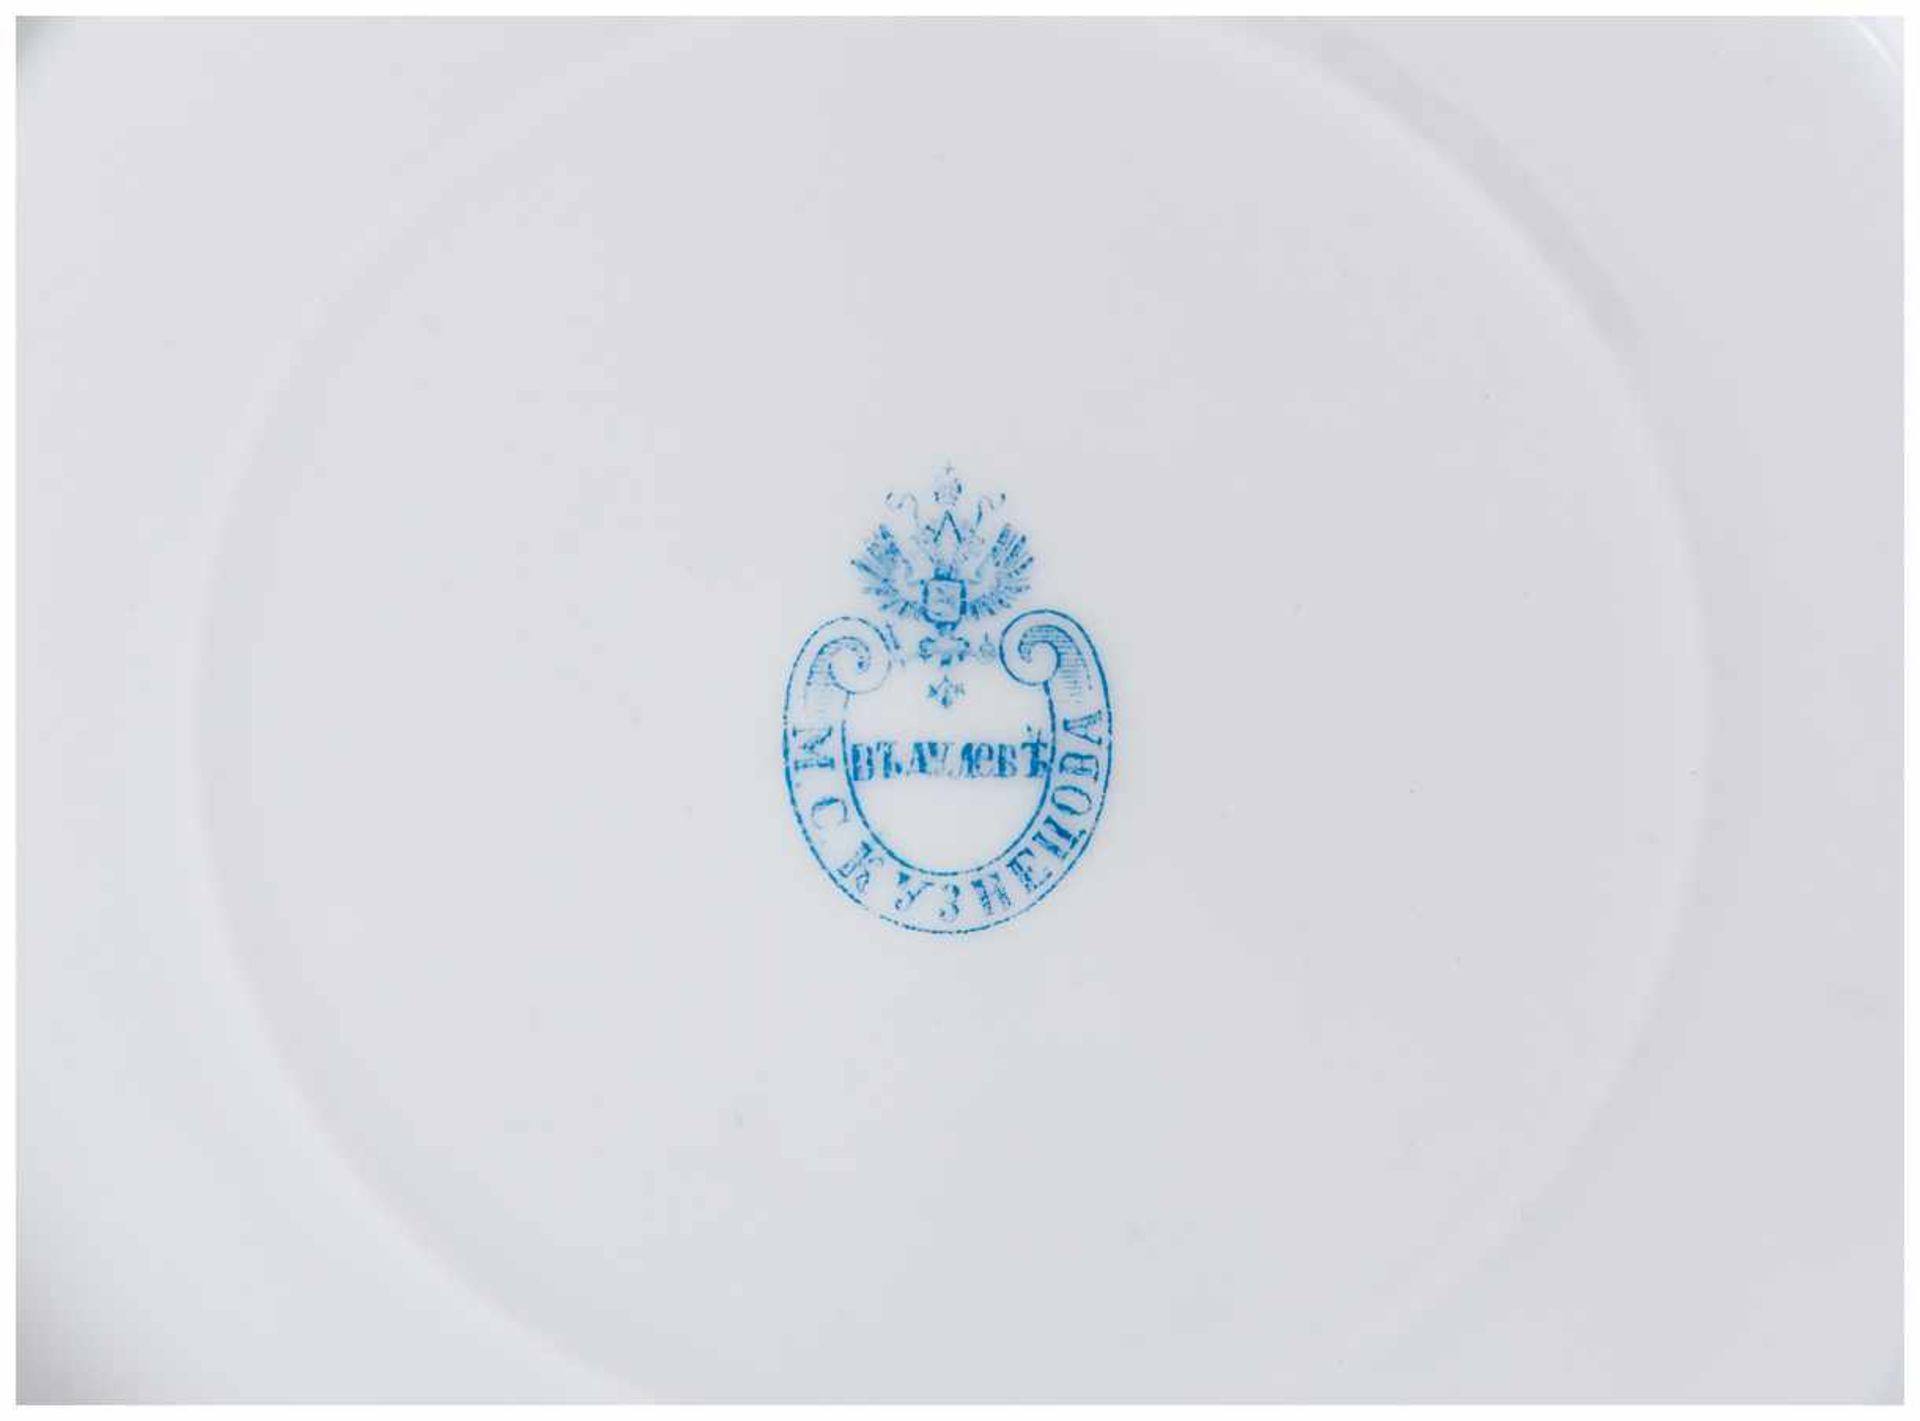 Los 28 - Service Porzellanmanufaktor Kuznetsov, Russland 1864 - 1889 26 teilig, wie abgebildet, Teller: